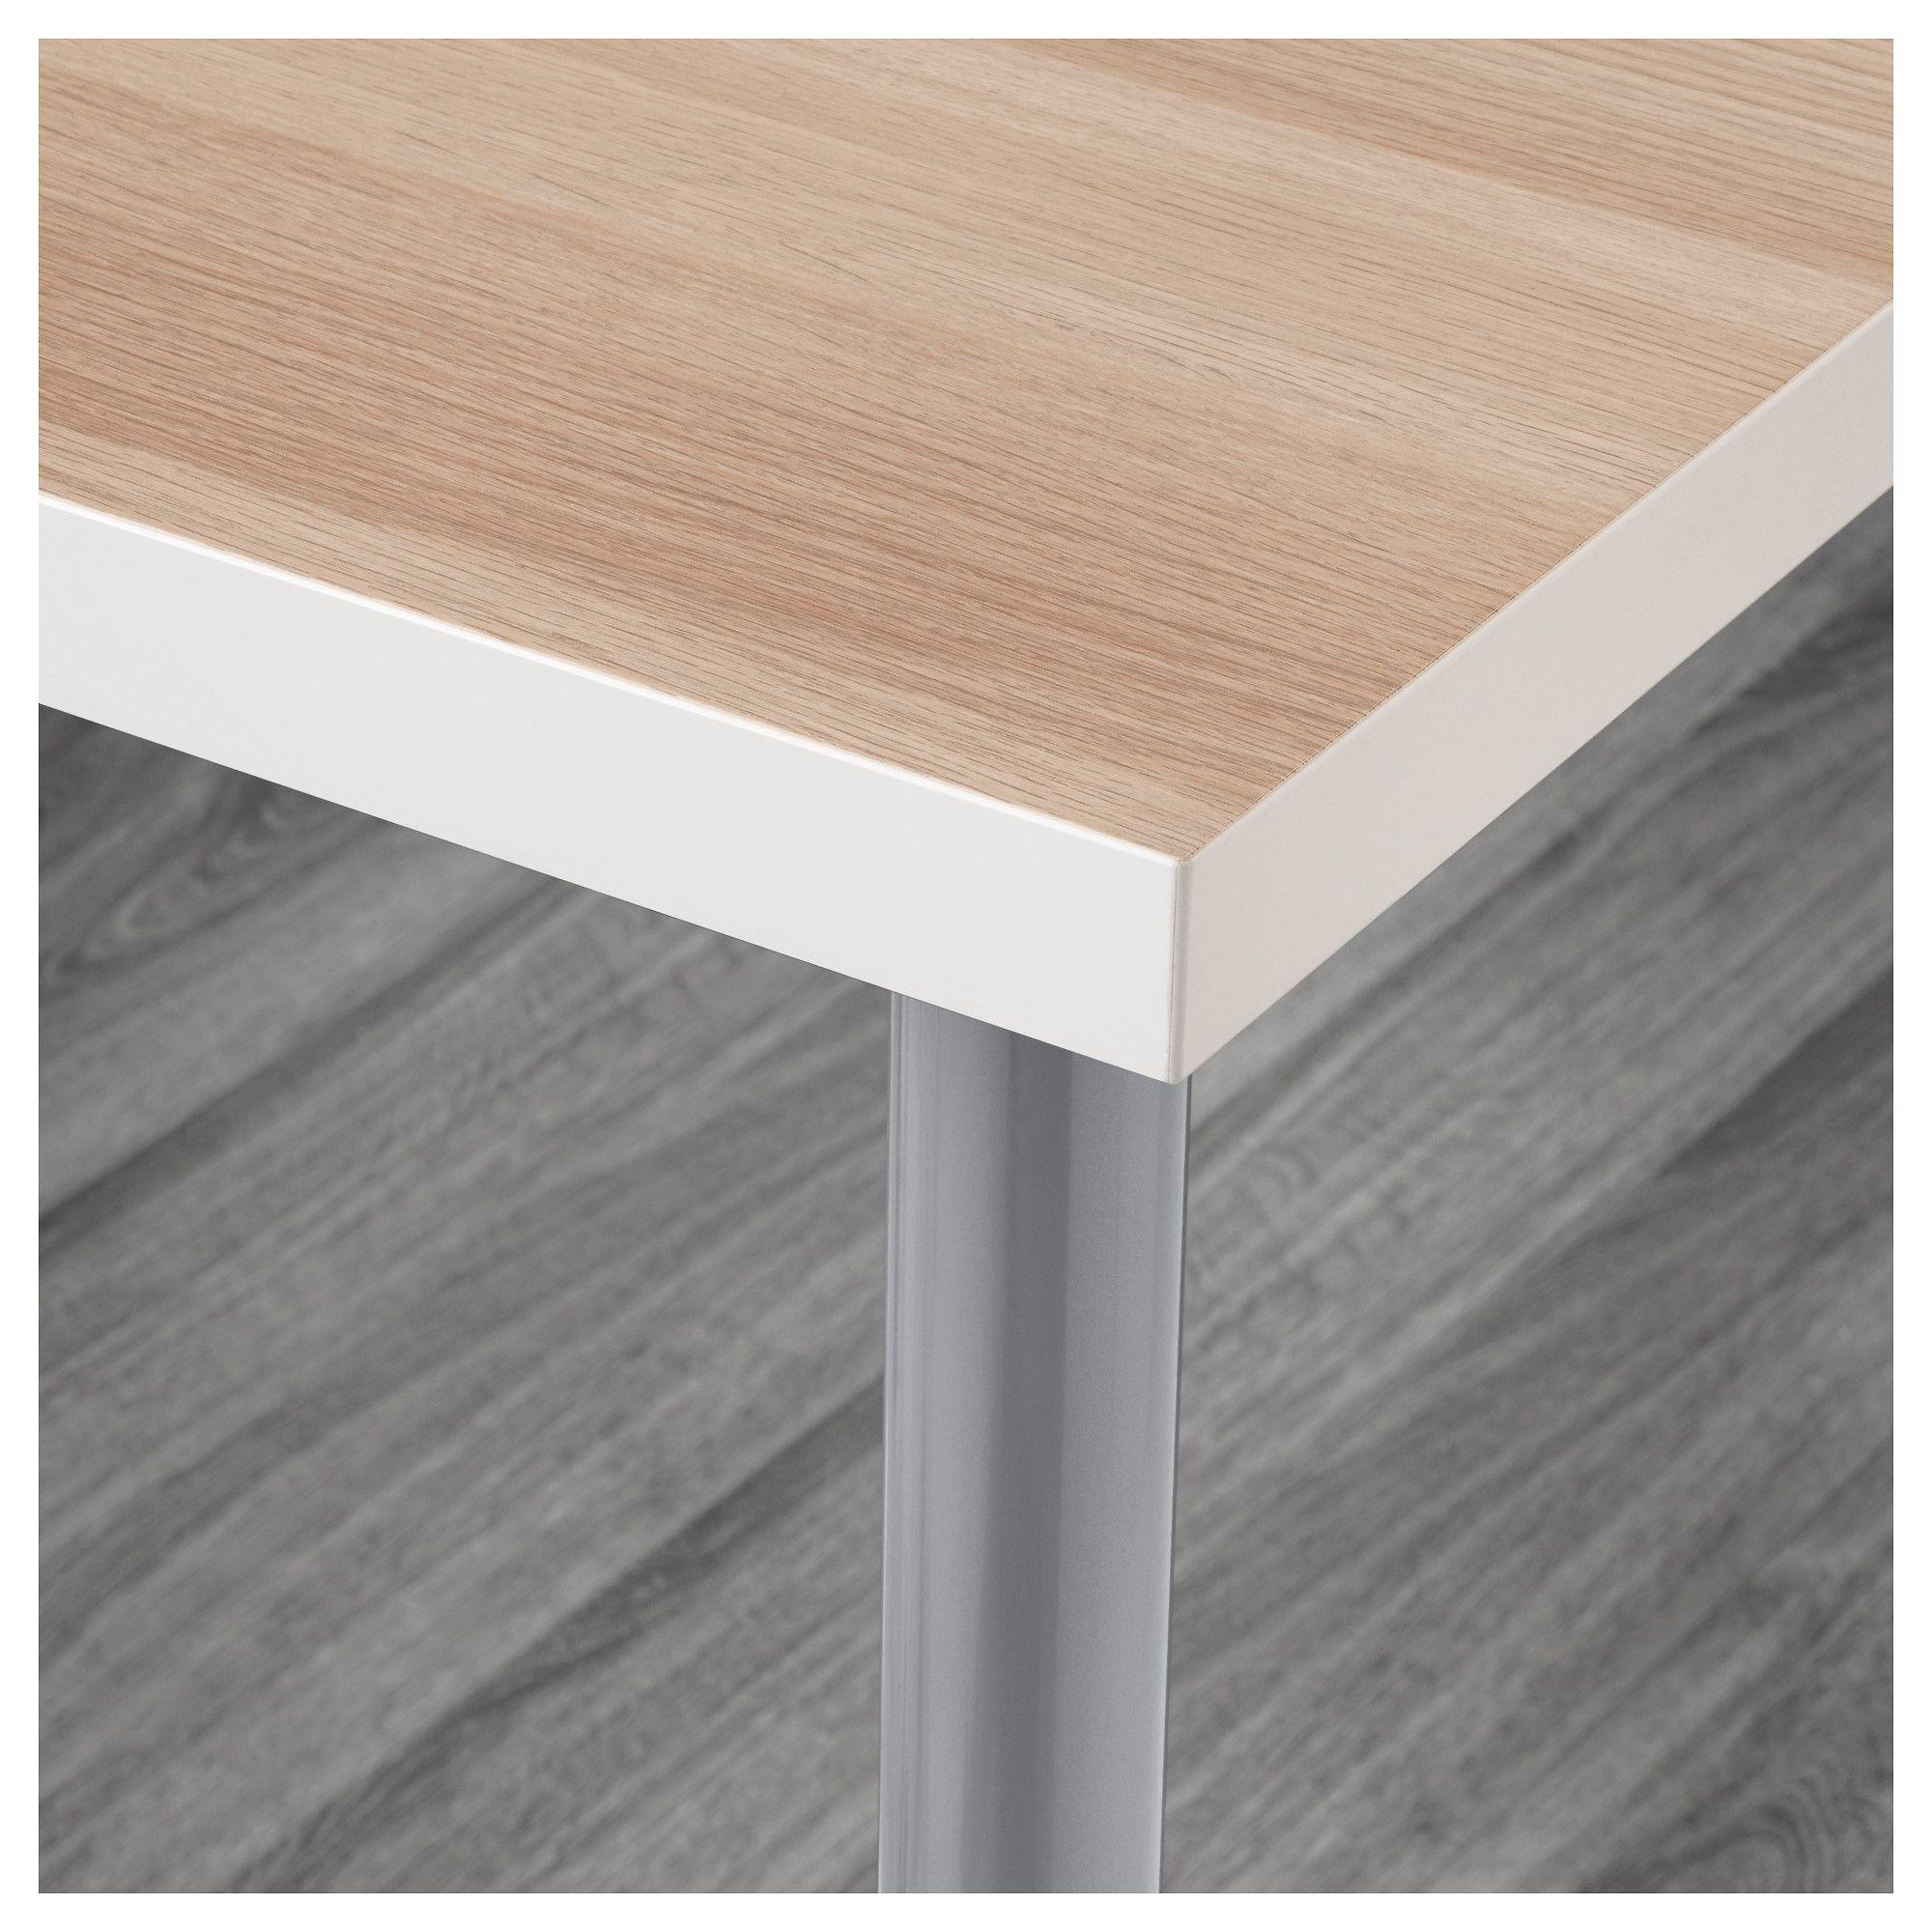 White Wash Gel Stain: LINNMON / OLOV Table White Stained Oak Effect